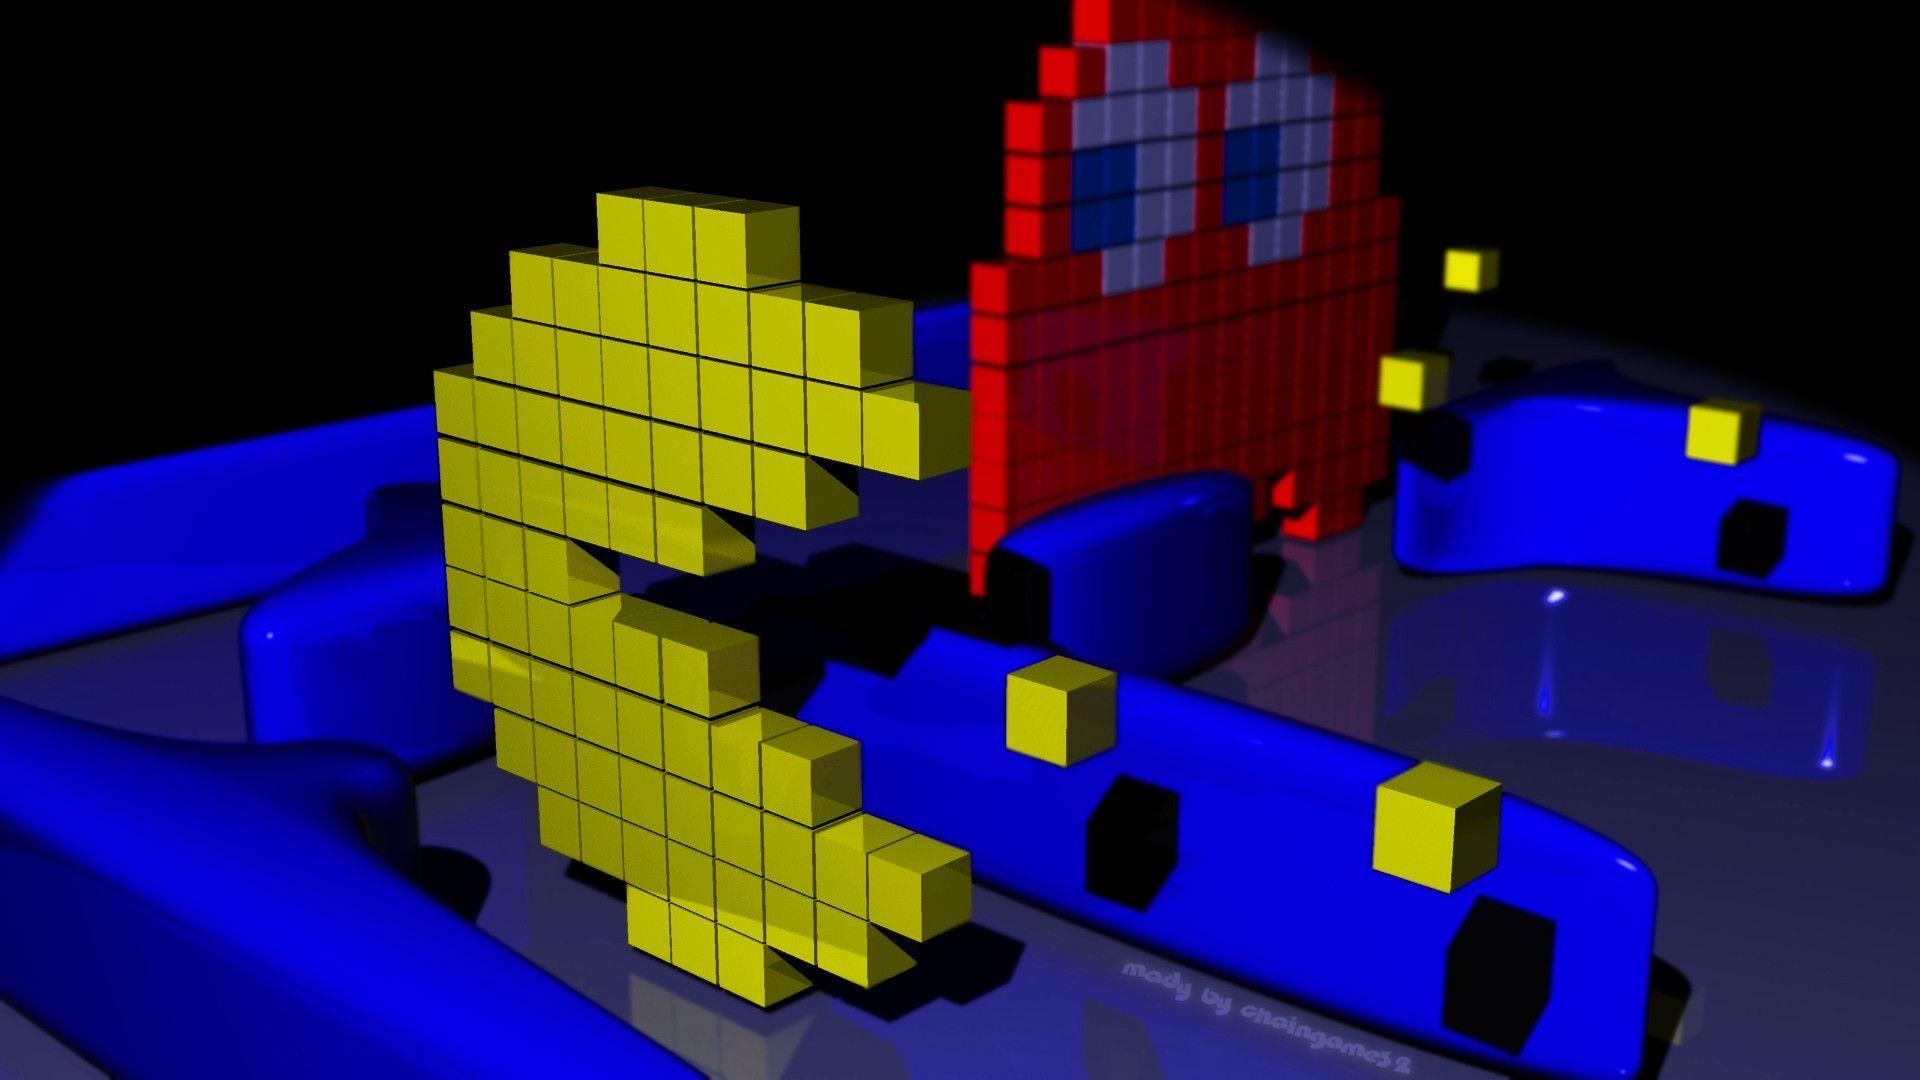 Pokemon 3d Live Wallpaper Pacman Wallpapers Wallpaper Cave